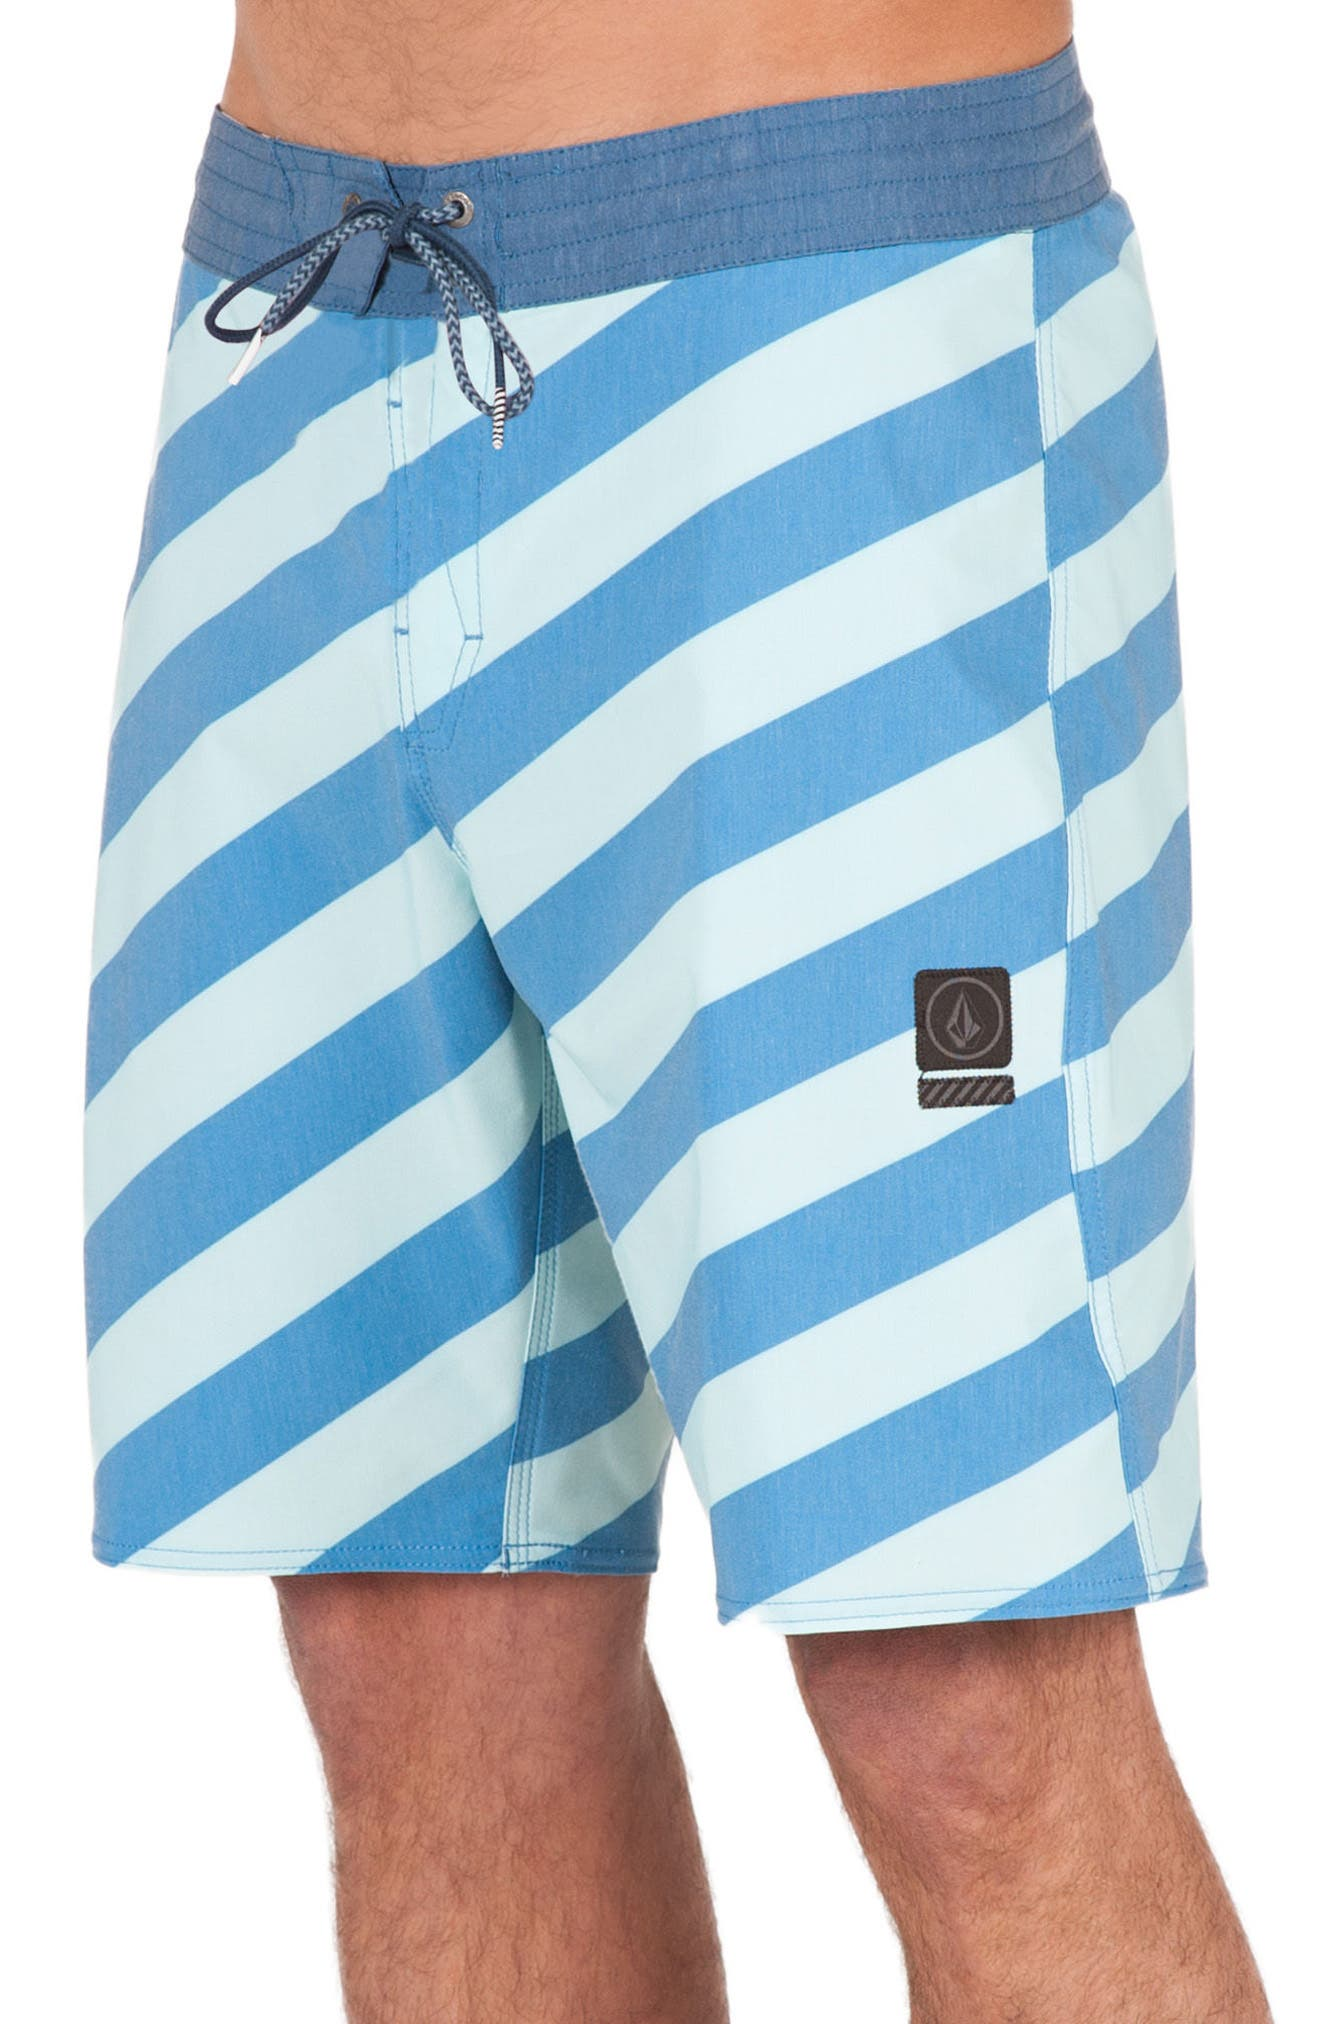 Stripey Slinger Board Shorts,                             Alternate thumbnail 25, color,